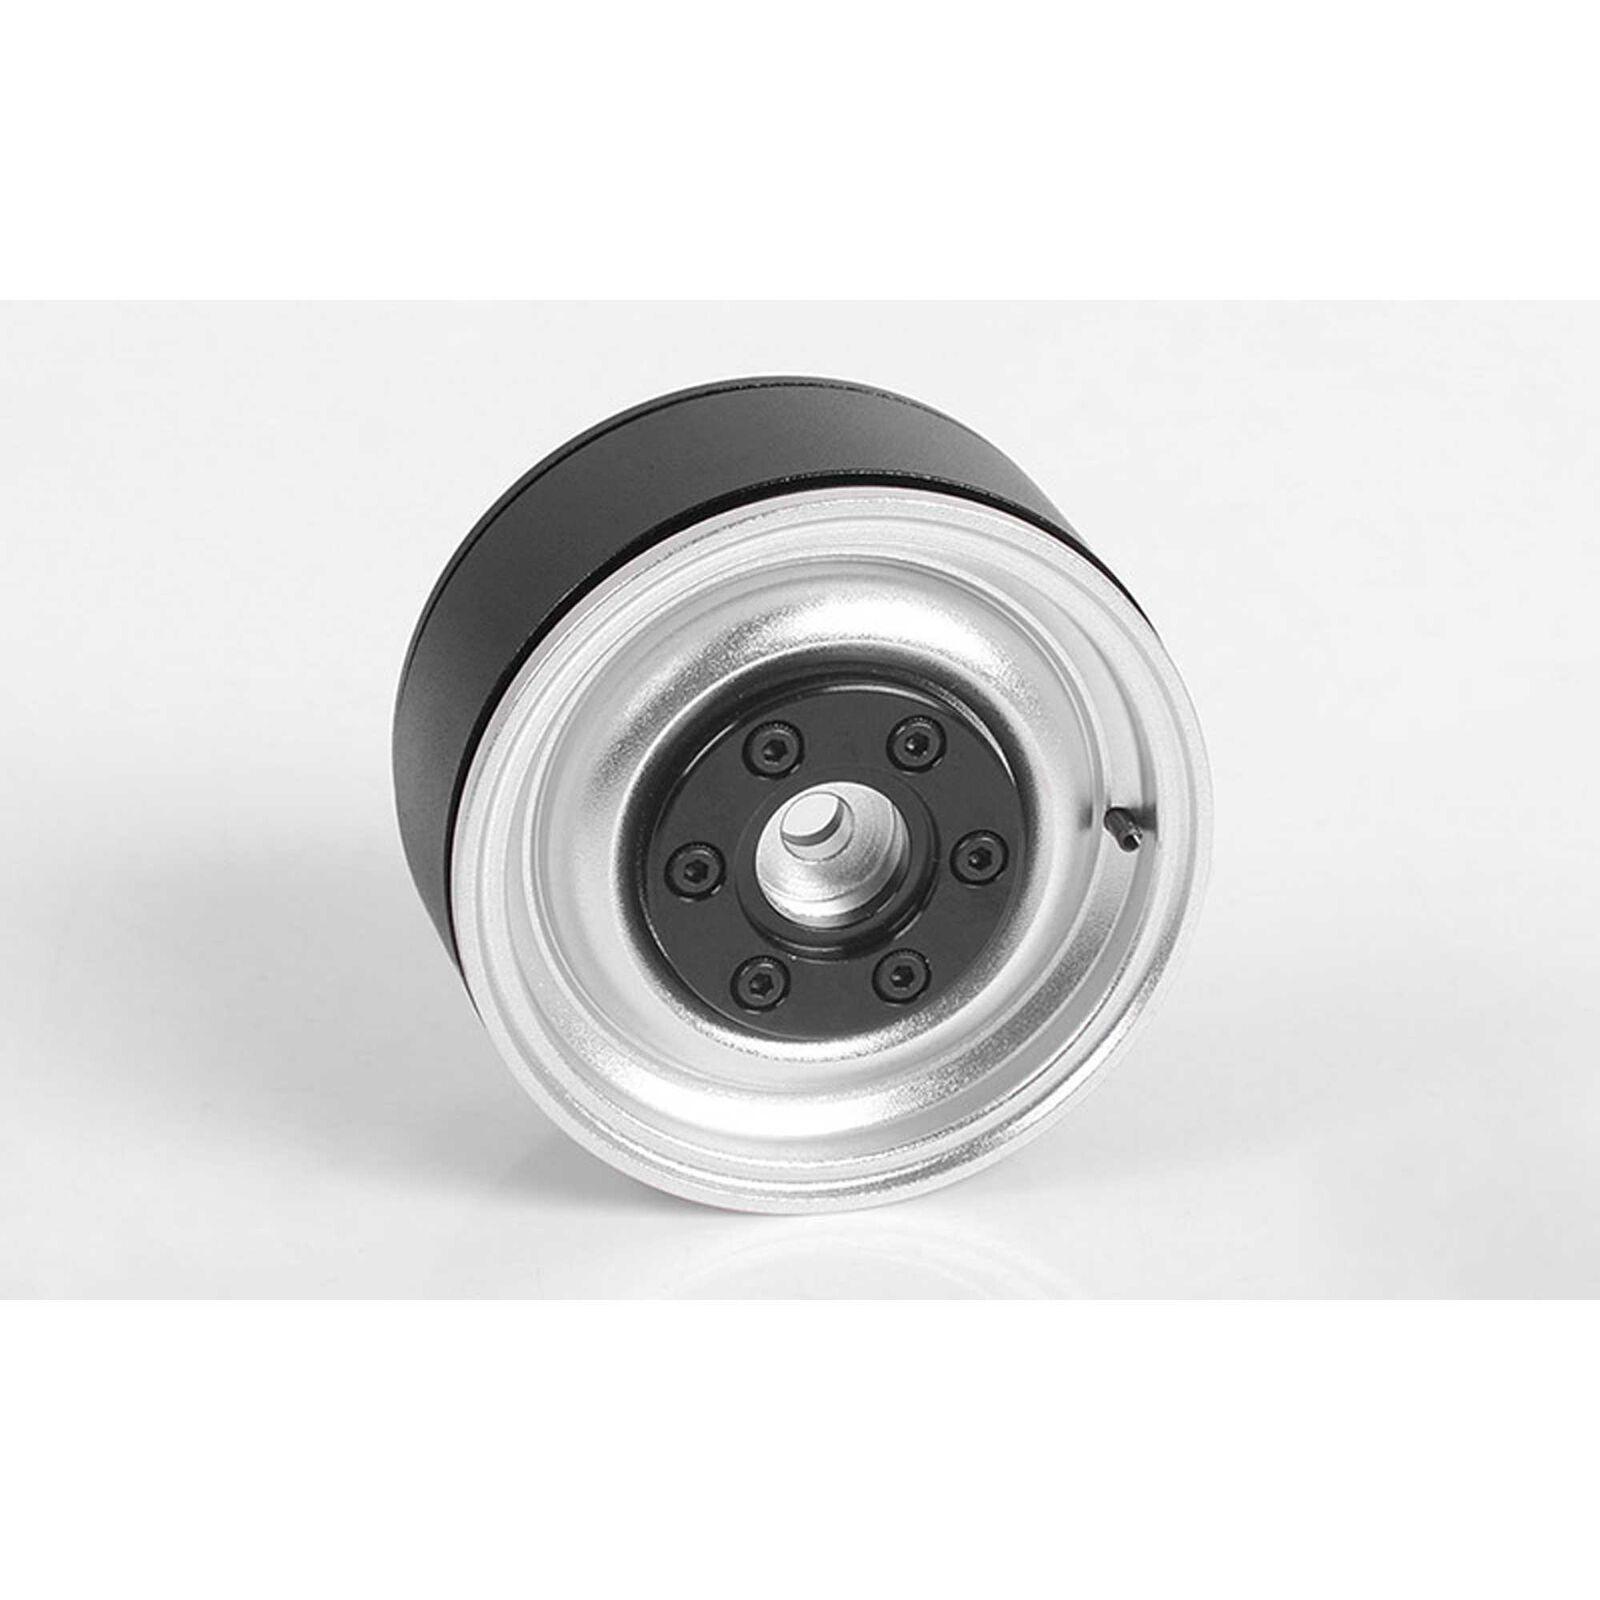 1/10 Vehement 1.9 Front/Rear Internal Beadlock Crawler Wheels, 12mm Hex, Aluminum (1)